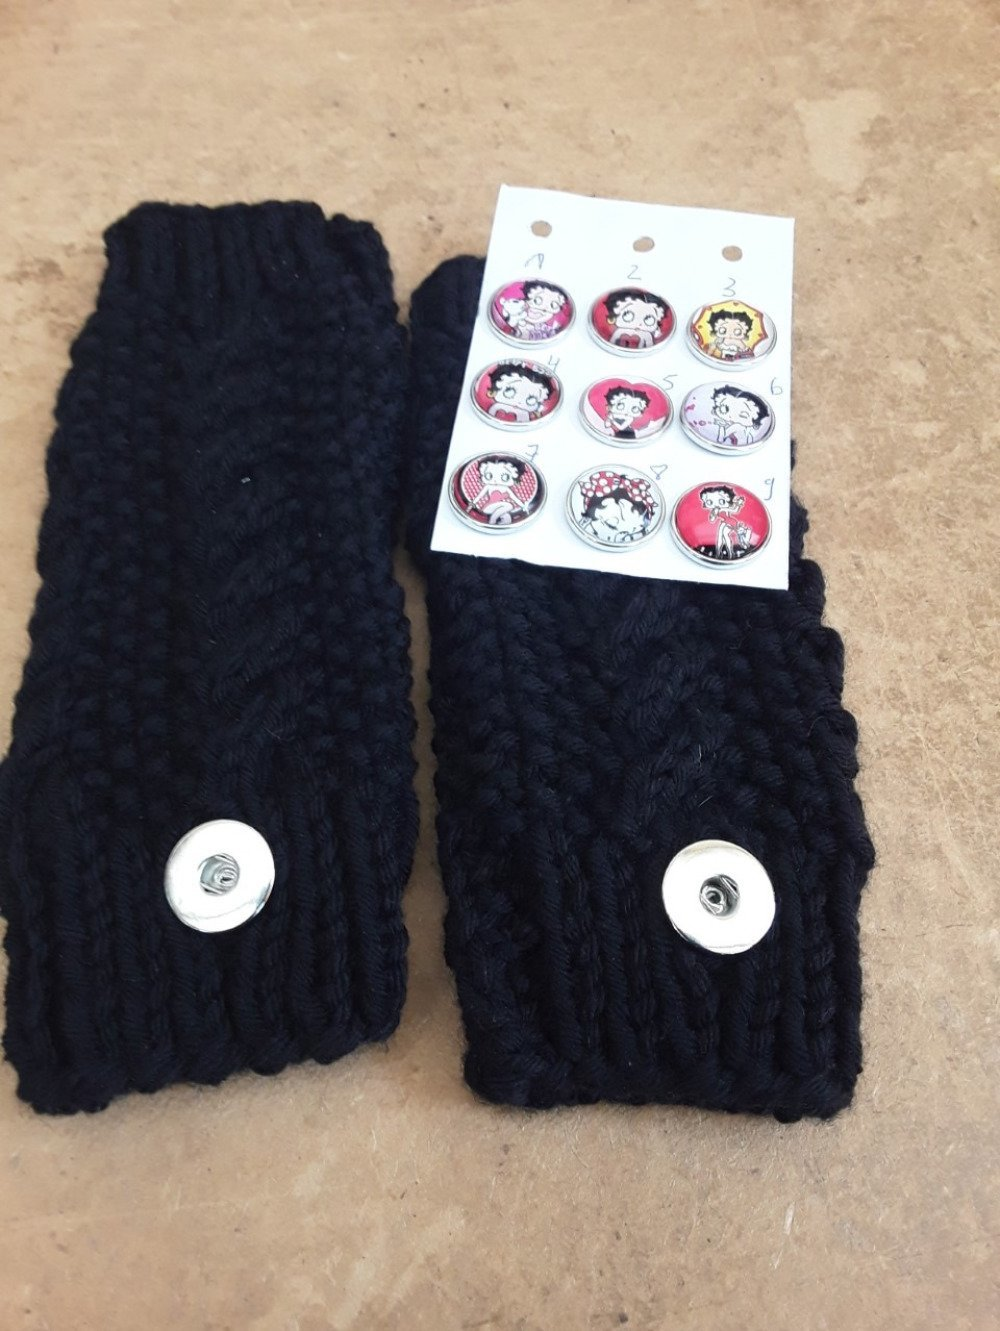 mitaines noires 18cm, laine, betty boop